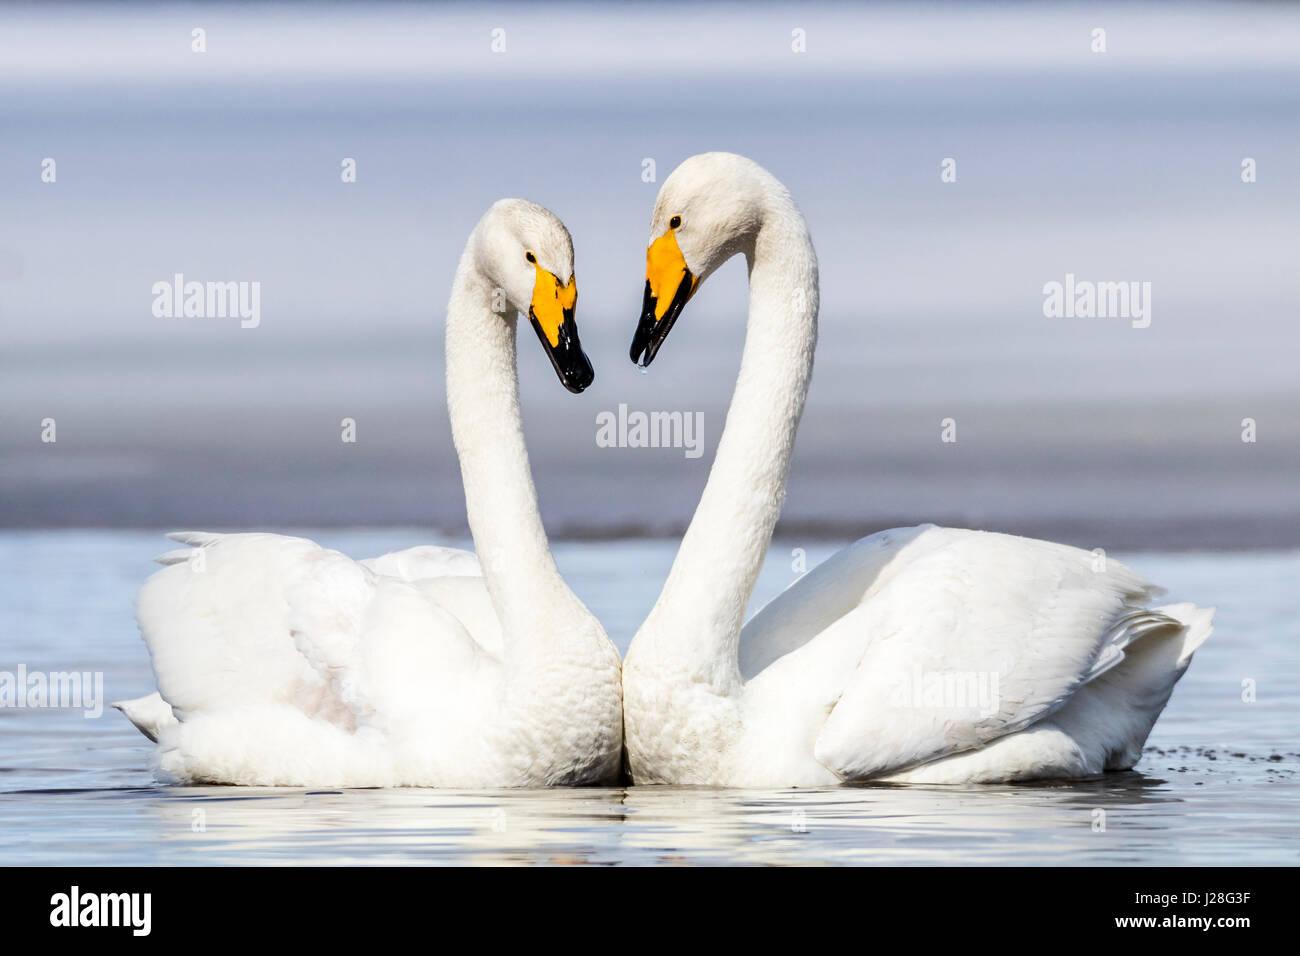 Whooper swan - Stock Image